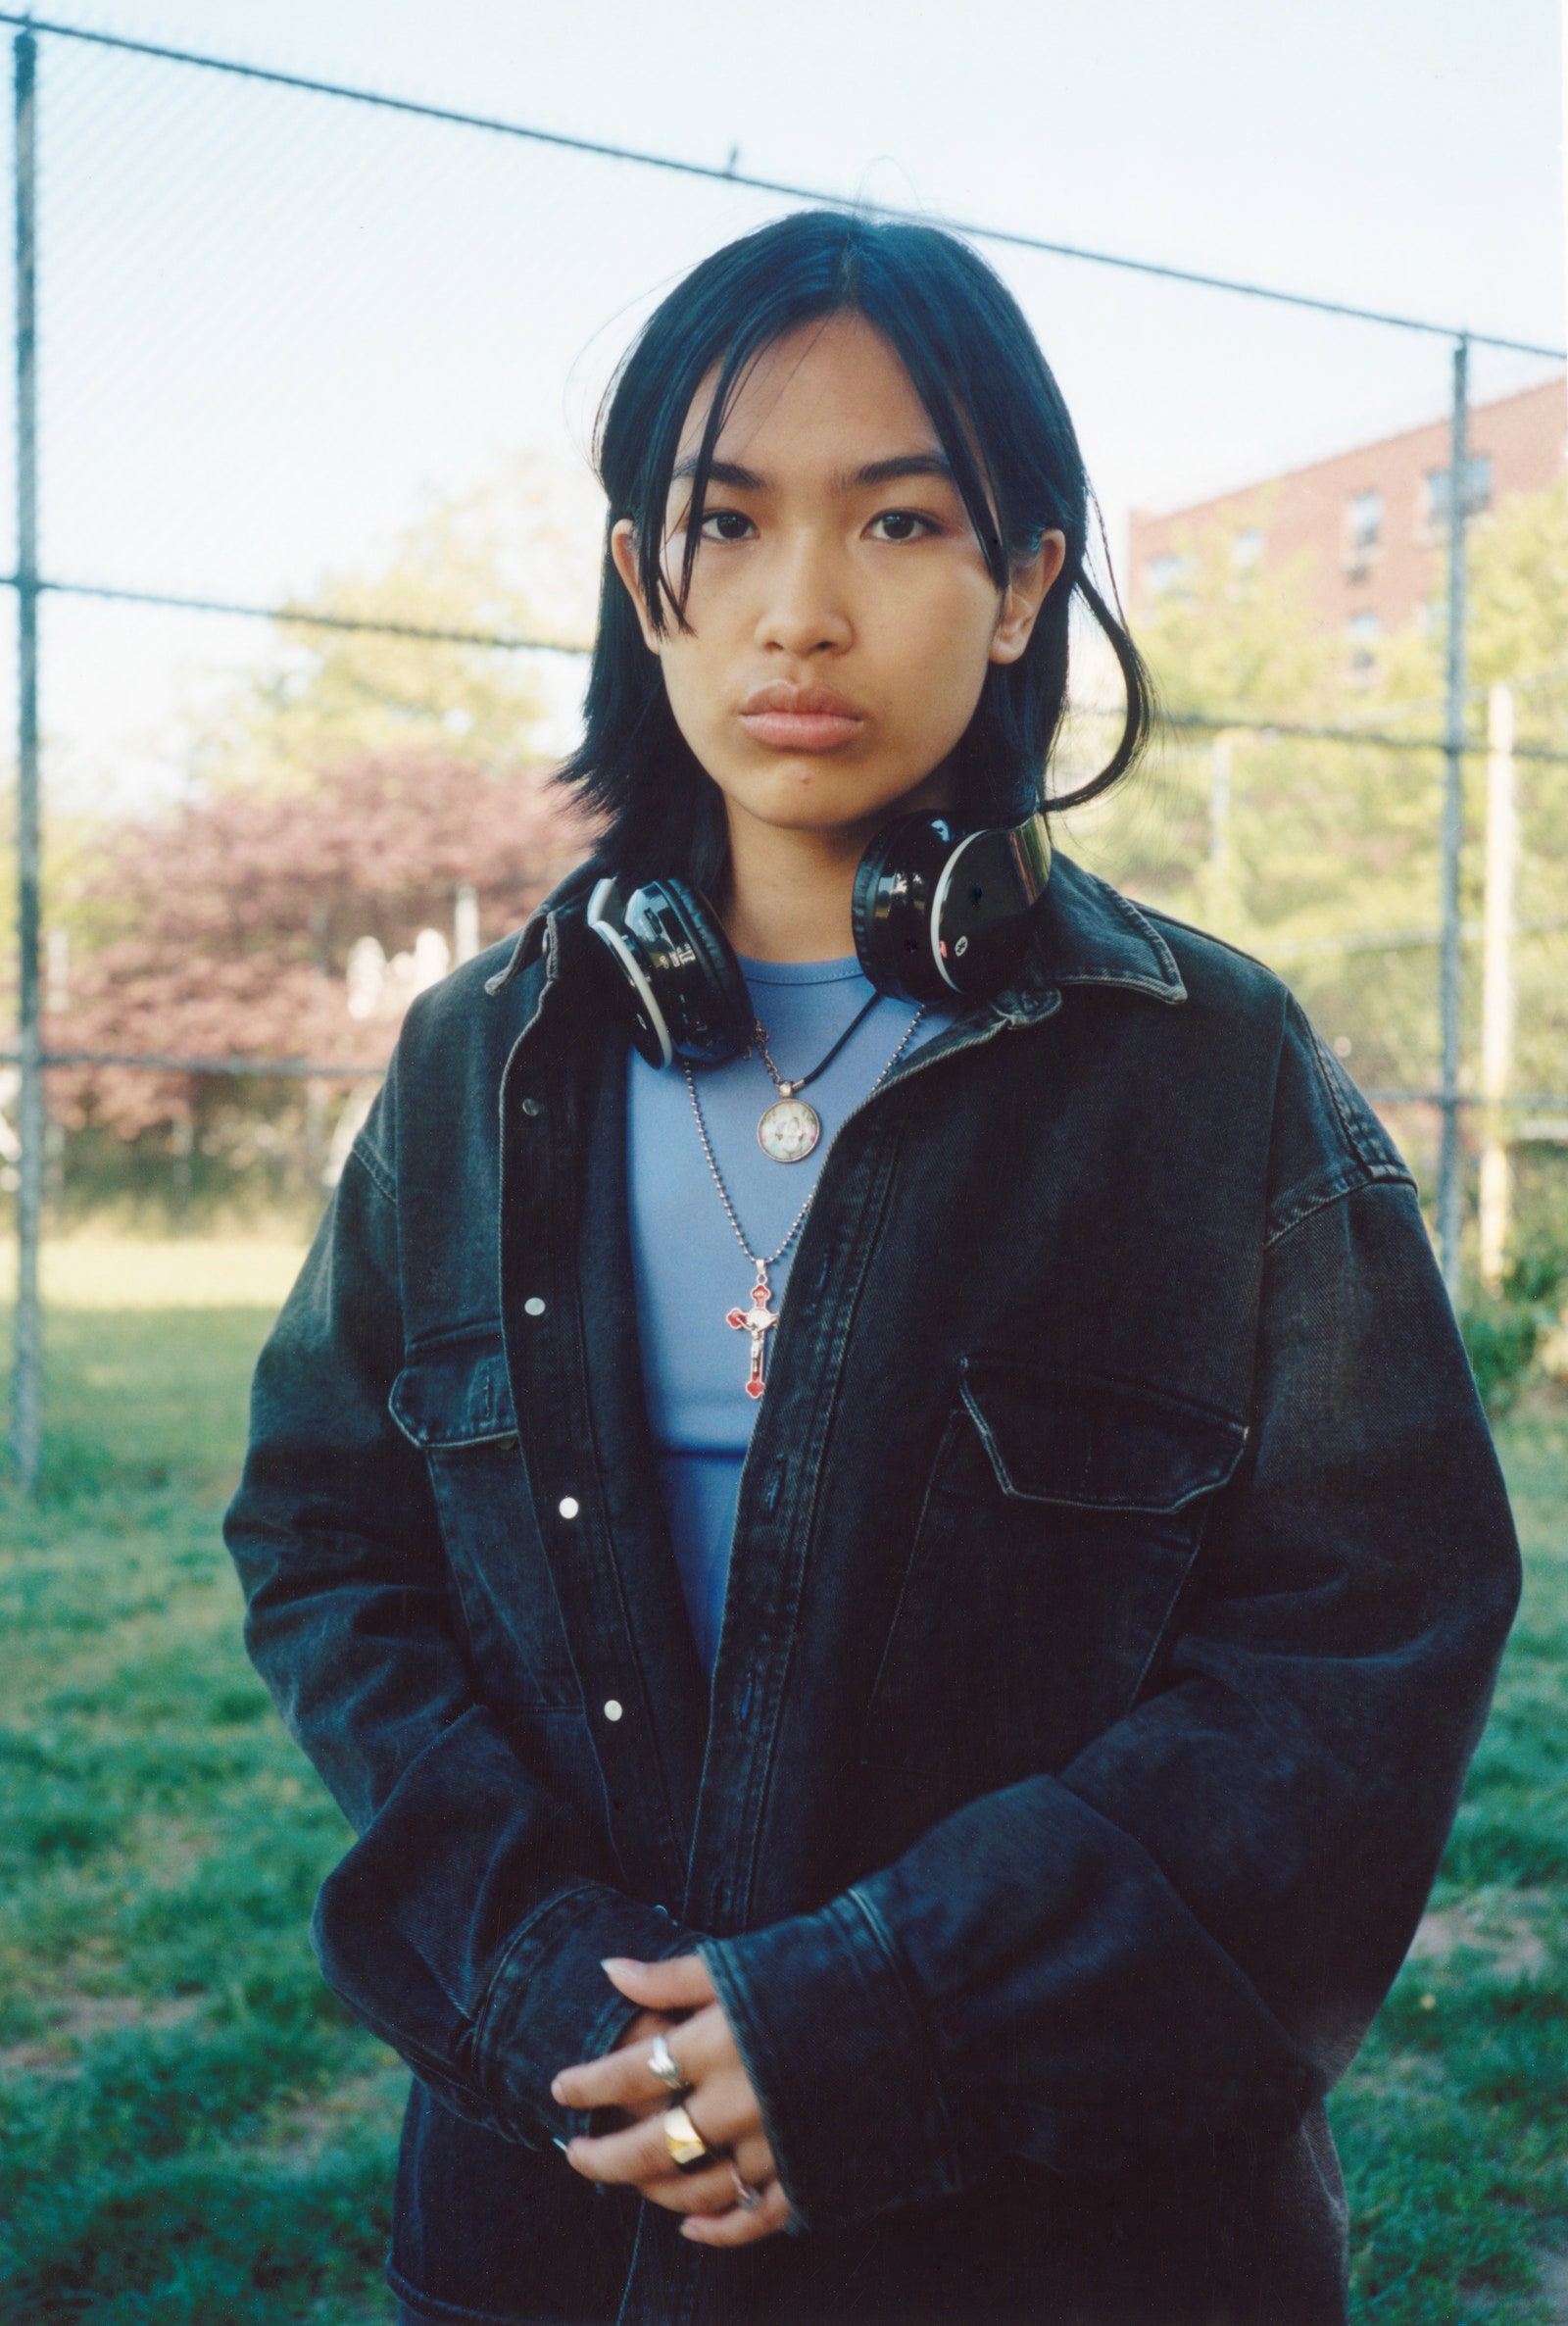 Hop Nguyen is a model based in New York City.